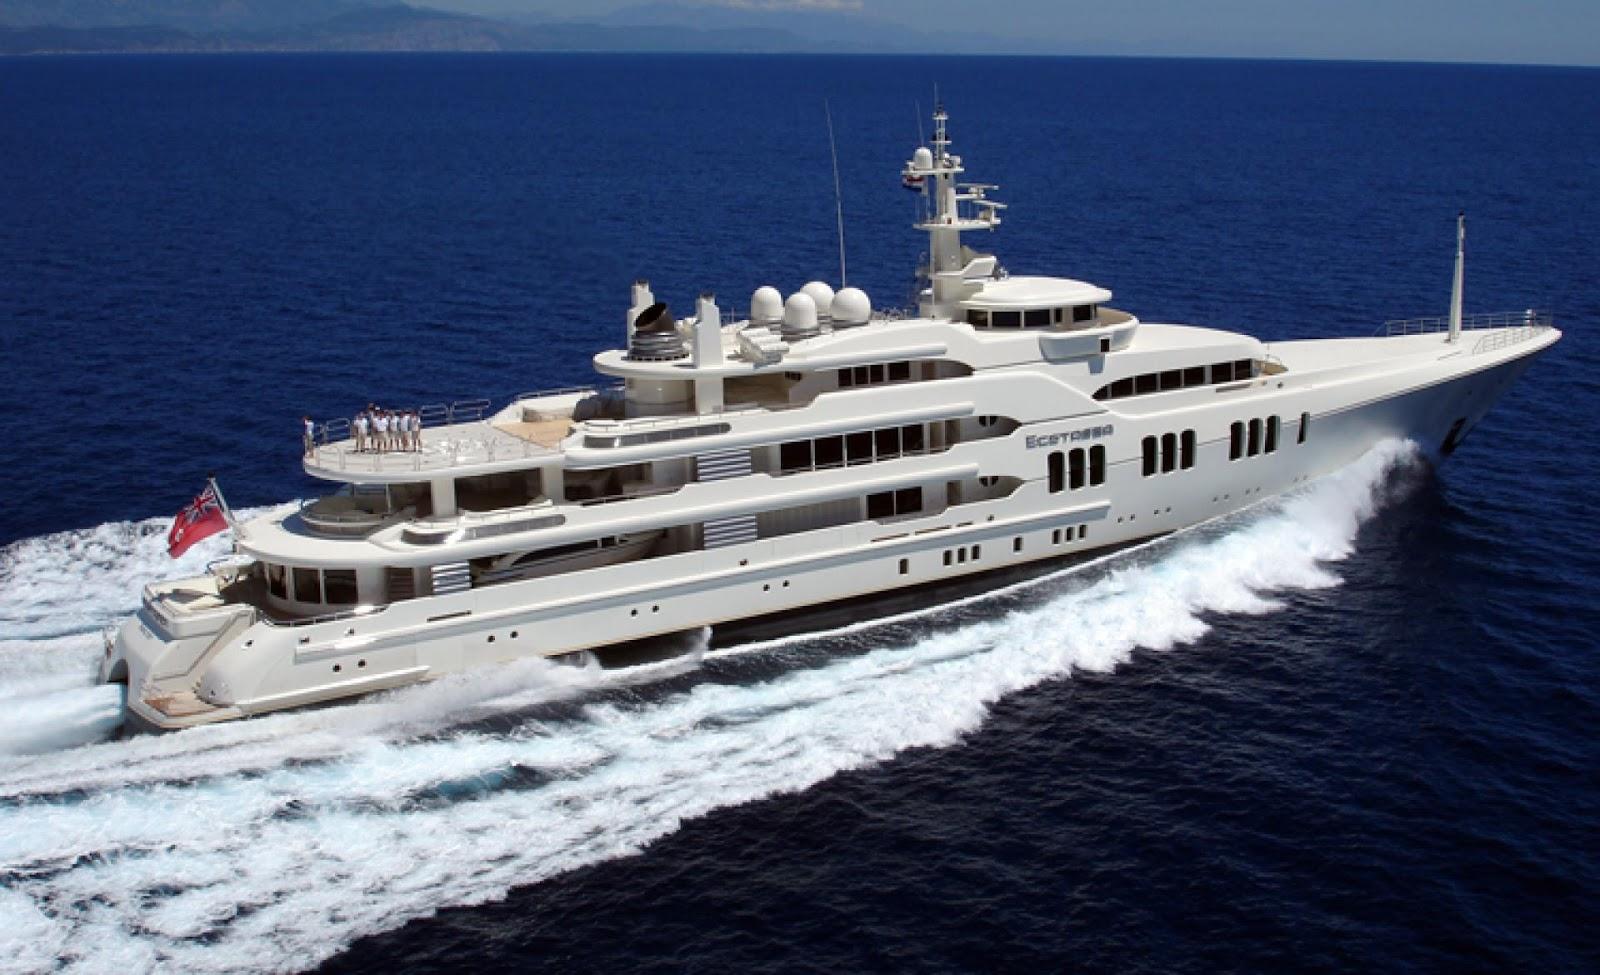 Megayacht ECSTASEA Starboard